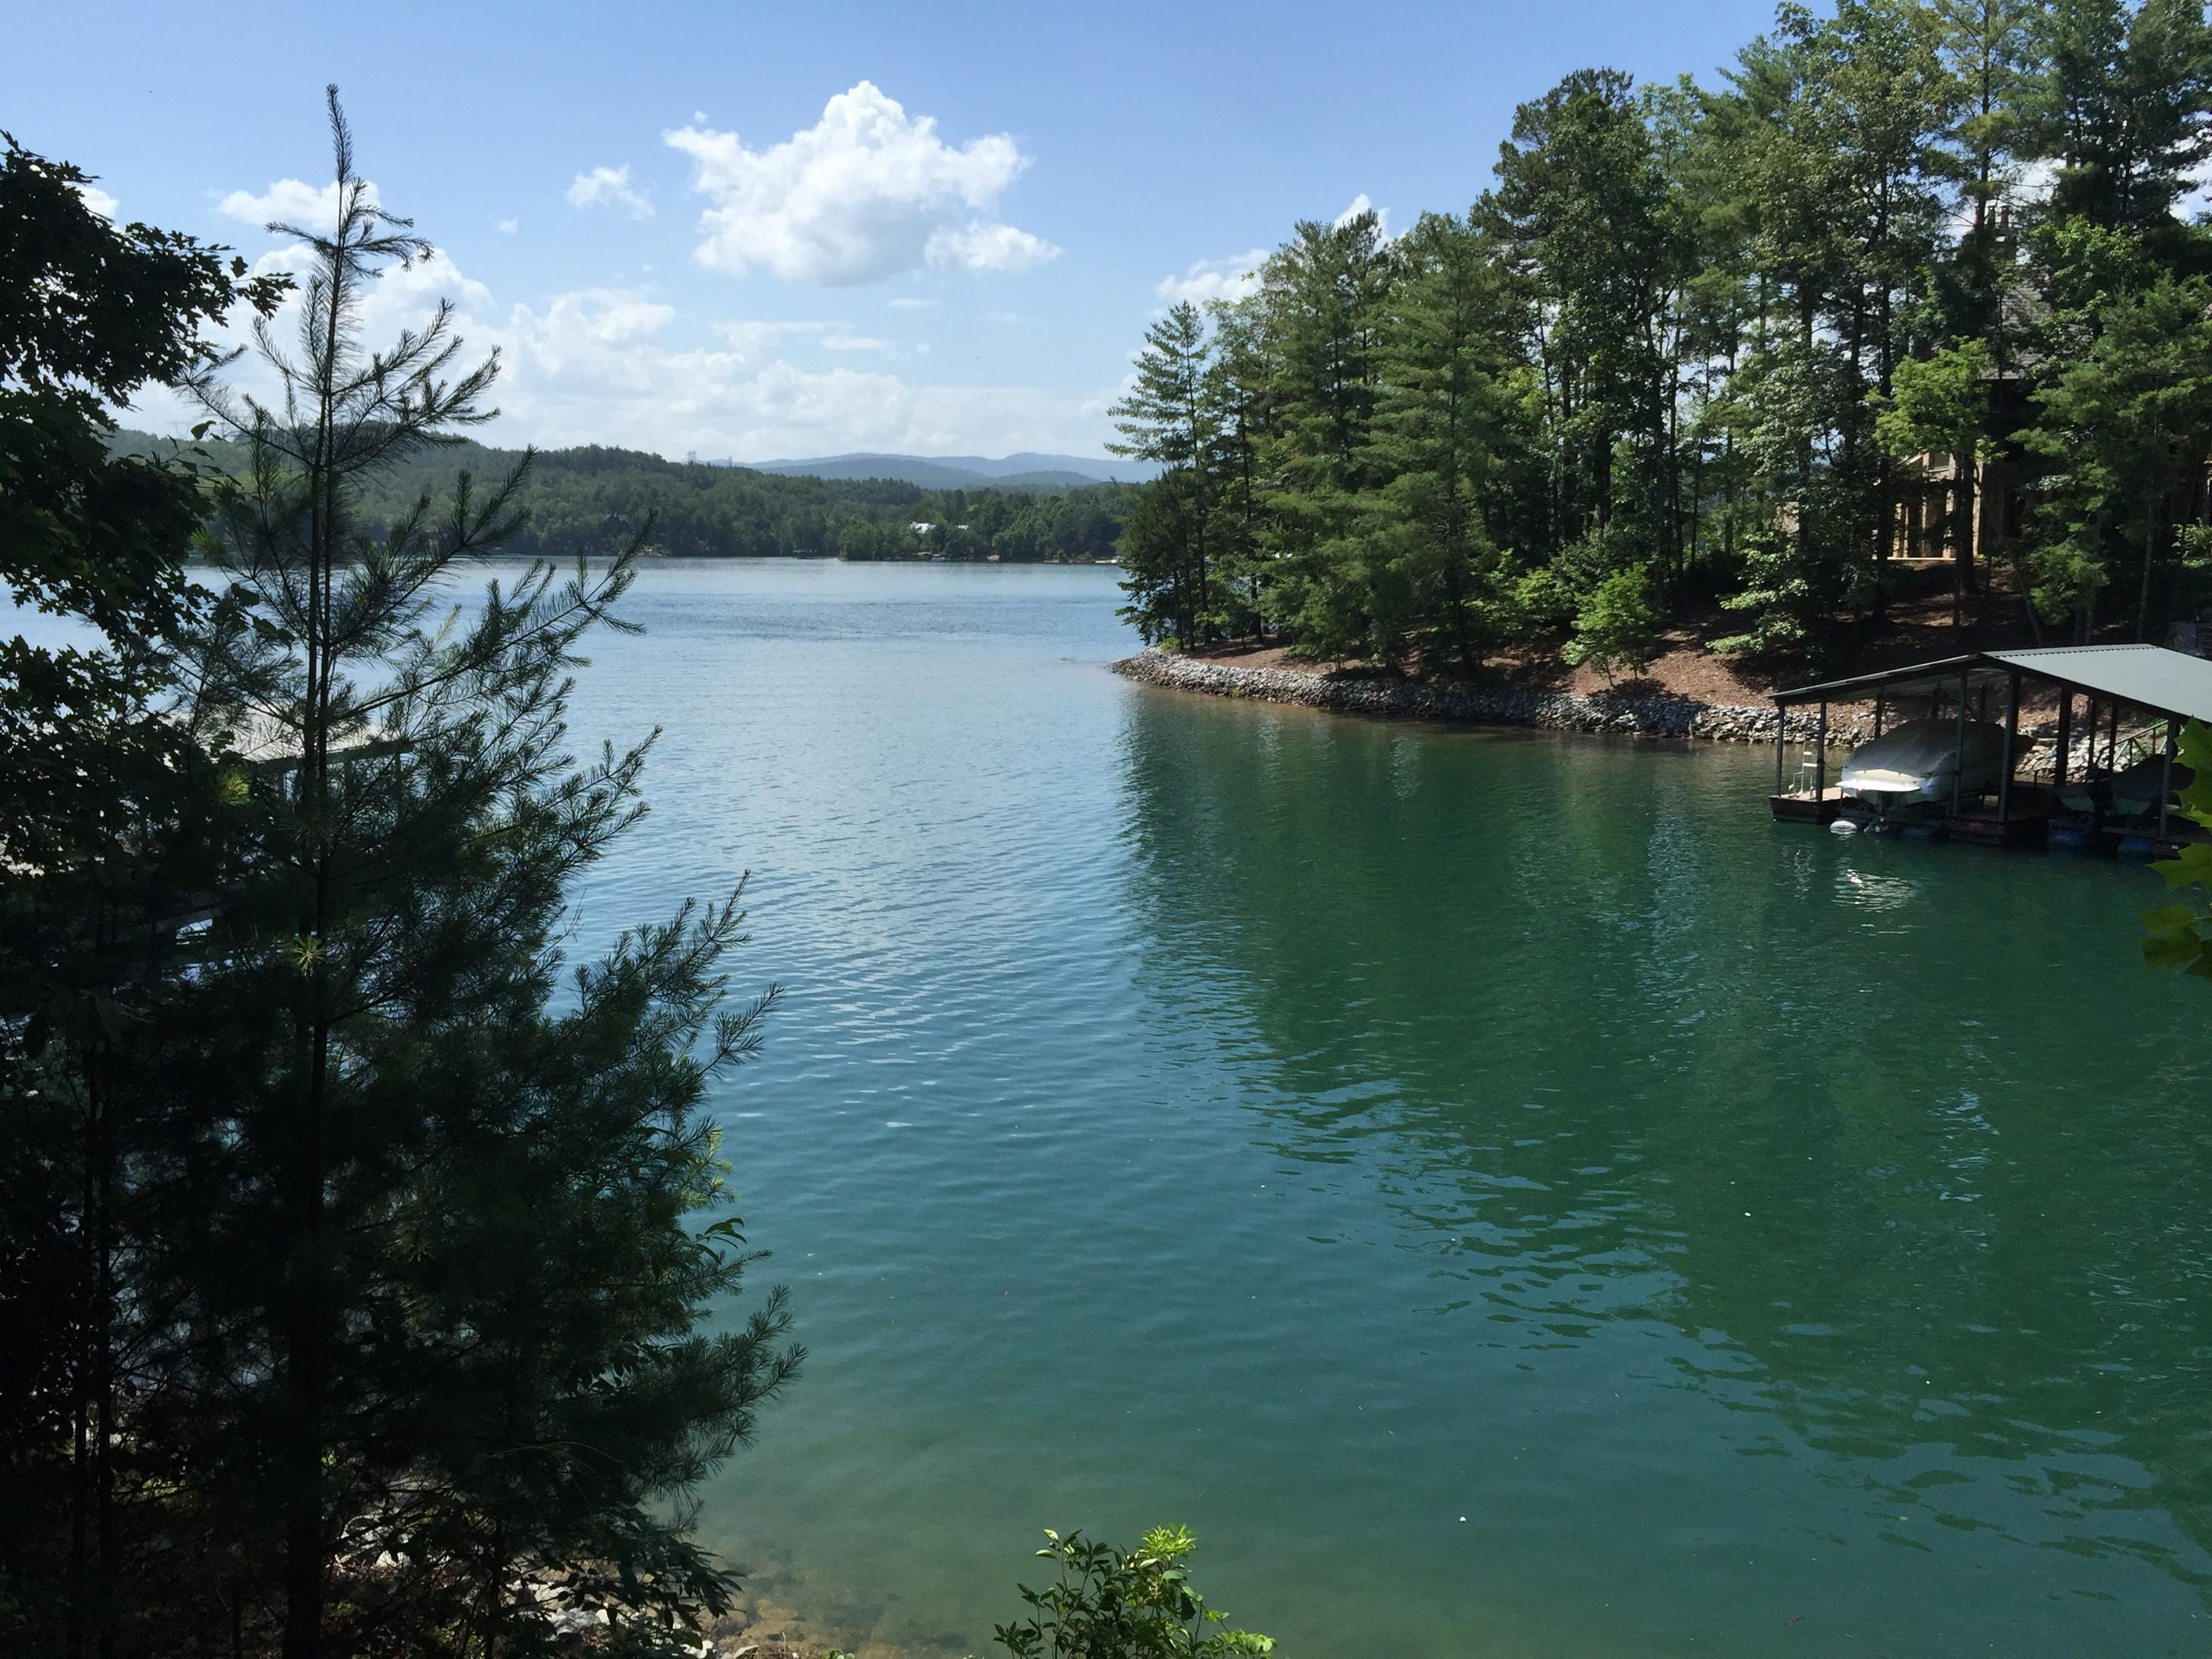 Terreno para Venda às Sports Membership Included with this Ideal Lakefront Homesite! S39 The Cliffs At Keowee Vineyards, Sunset, Carolina Do Sul, 29685 Estados Unidos